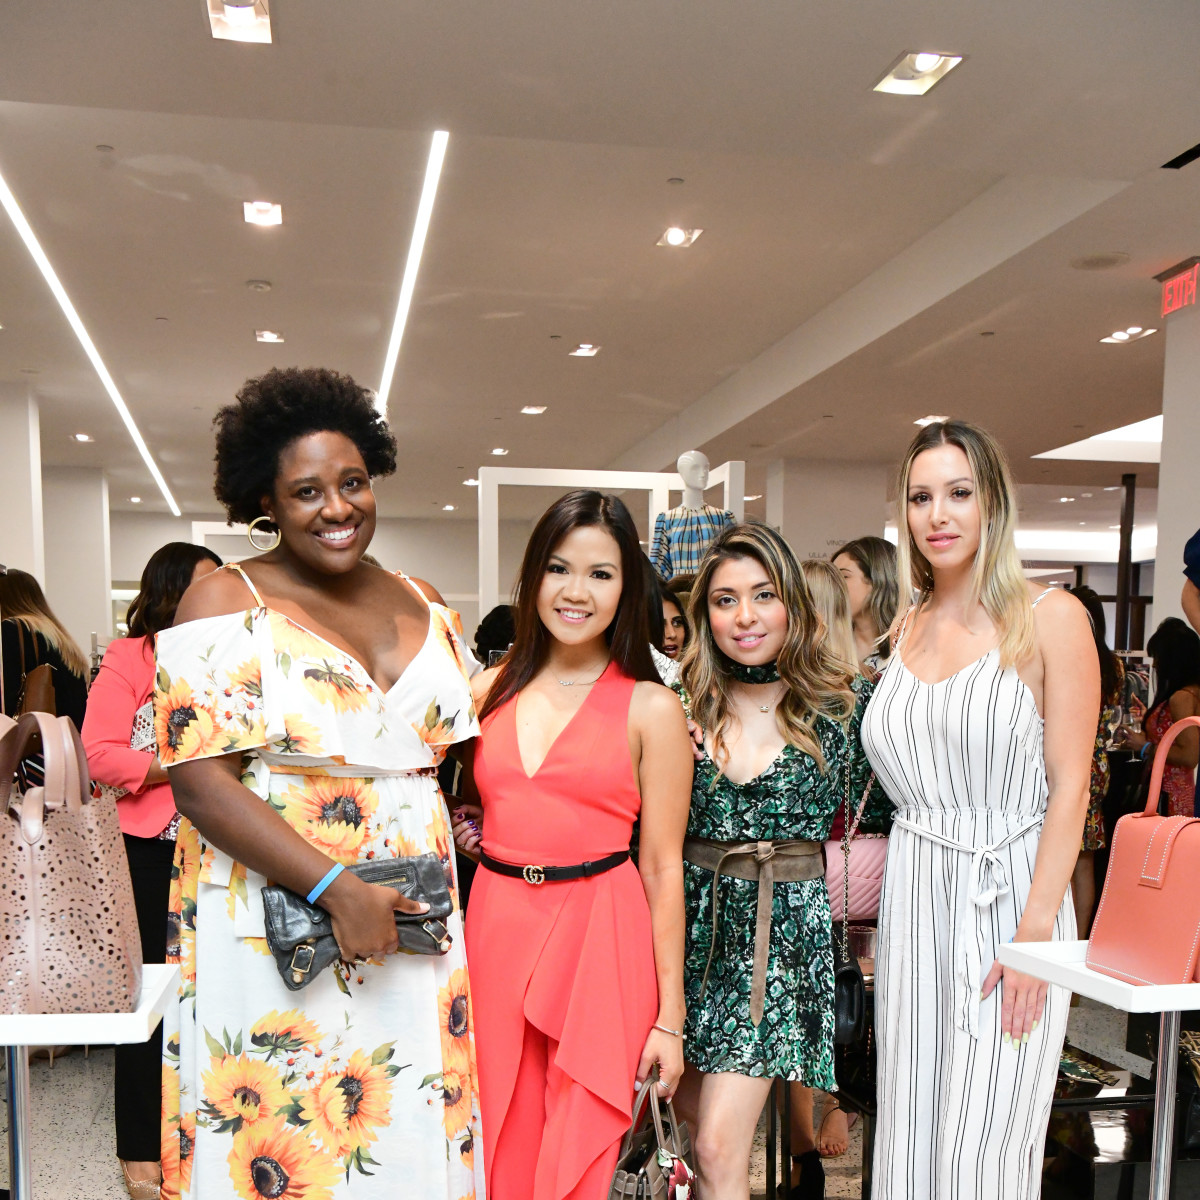 Summer Soiree Dress for Success WOW Tootsies Chelsea Wade, Angelica Bondoc, Steffany Velasquez, Jenniece Wotton